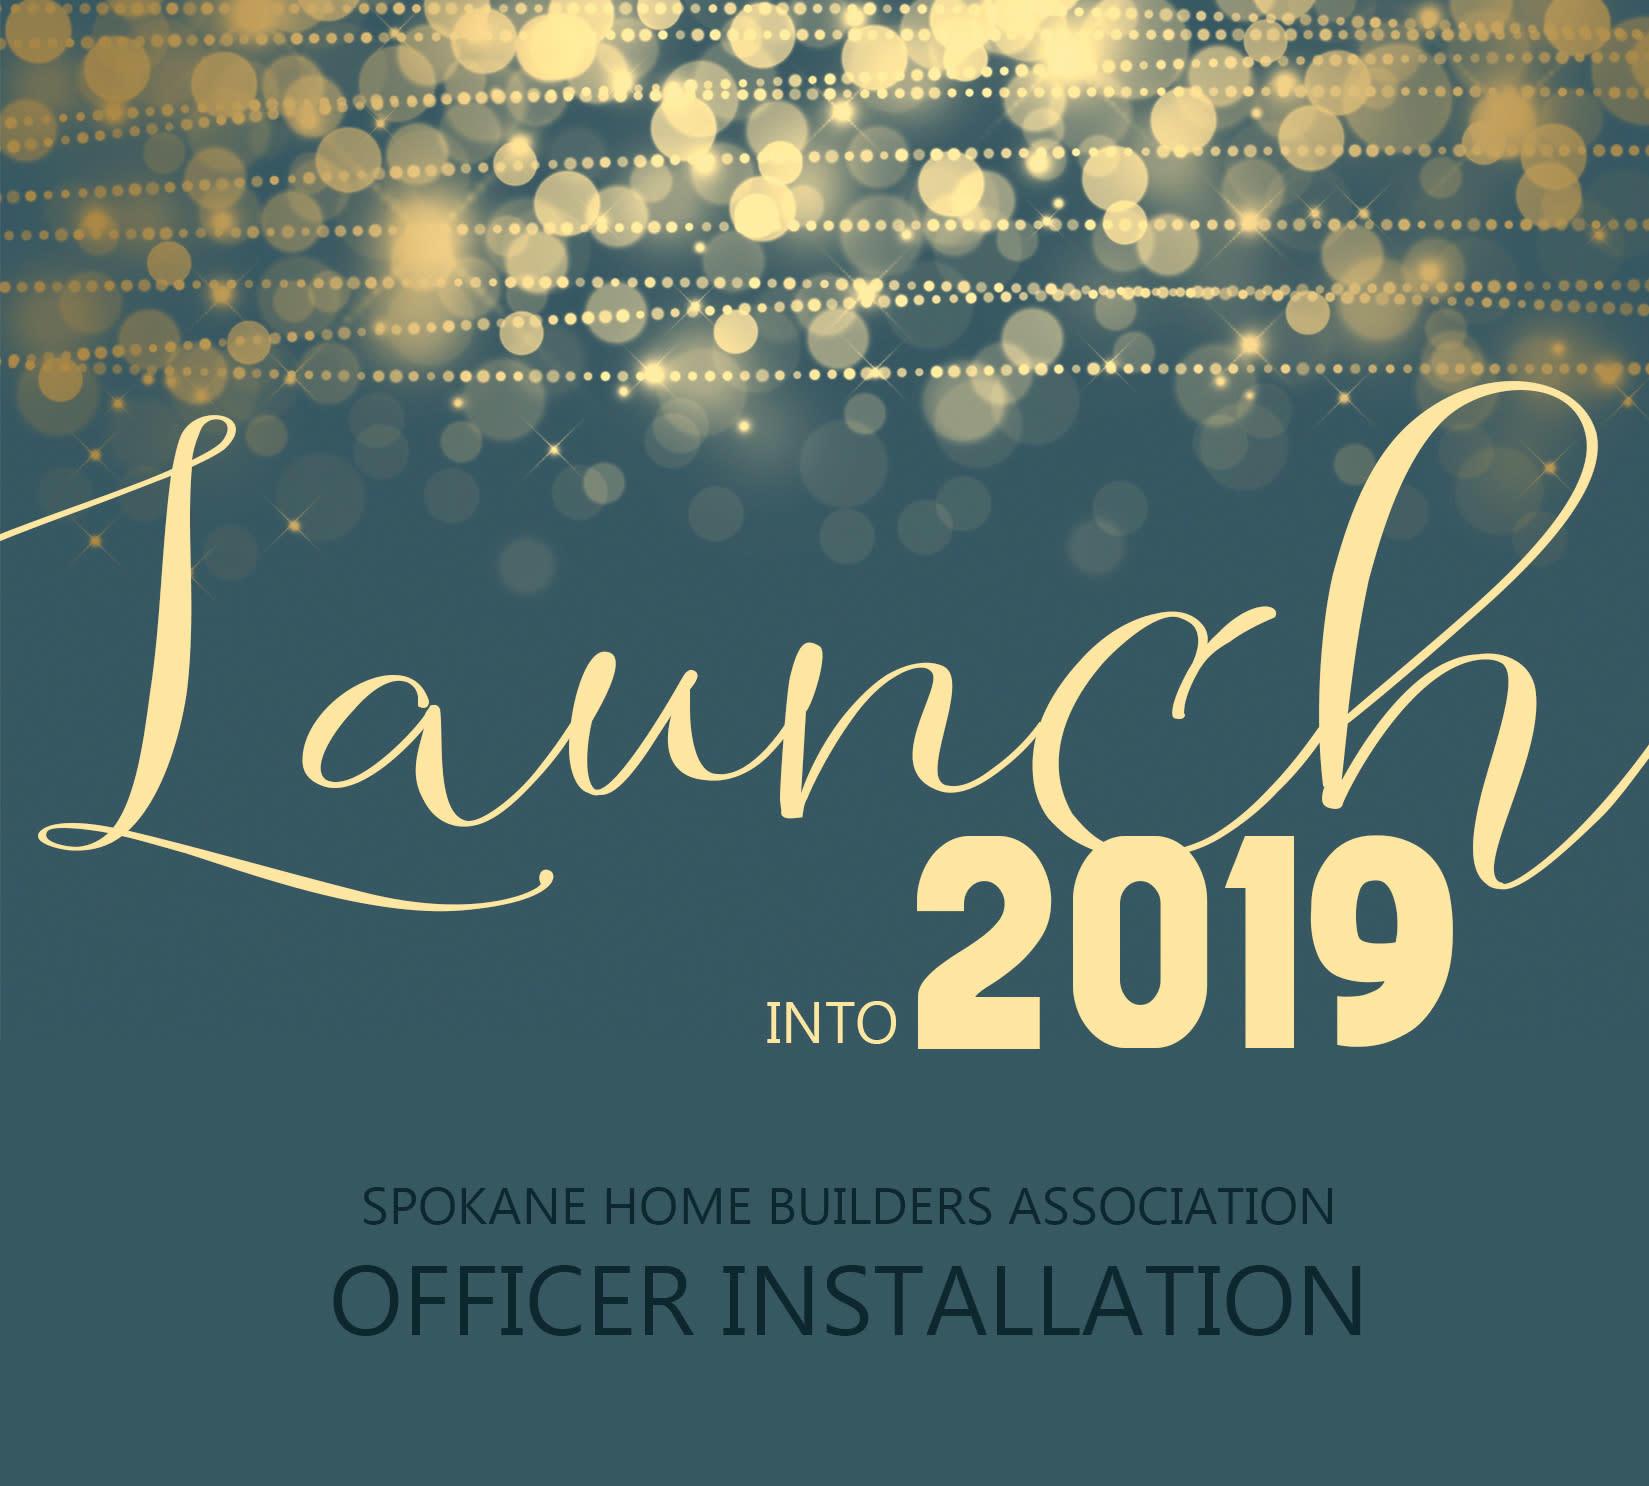 Spokane Home Builders Association